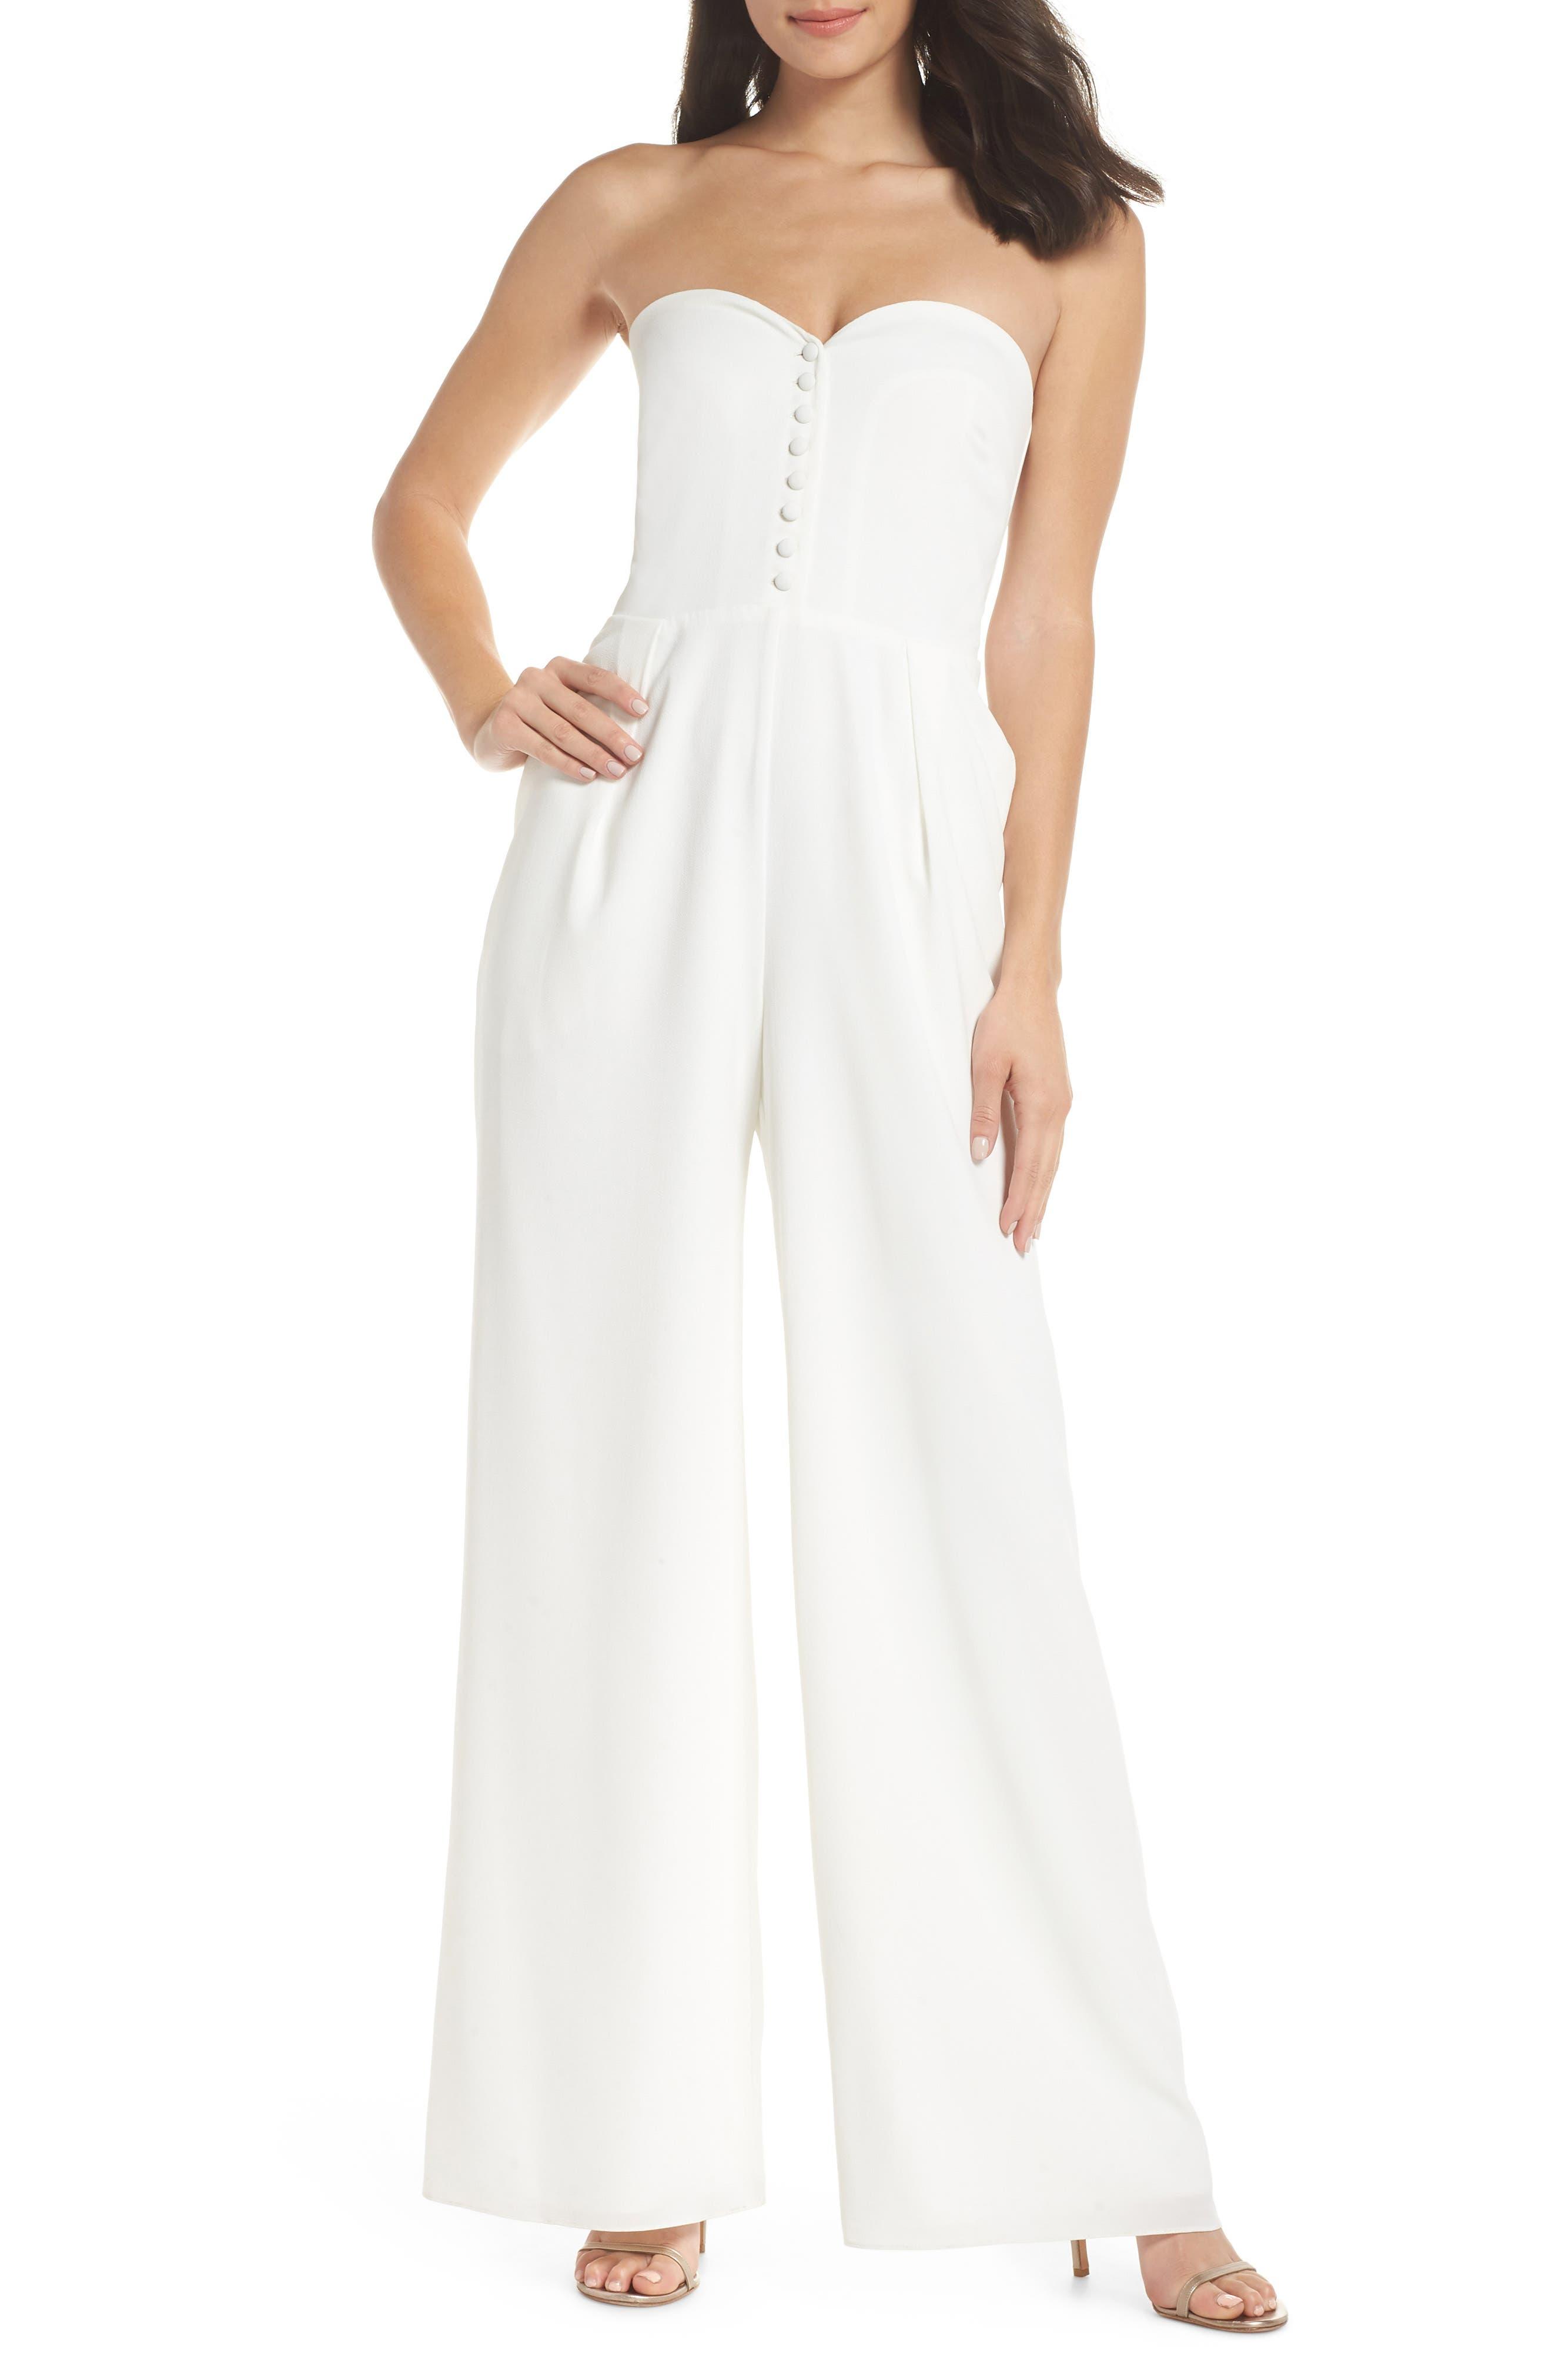 JOANNA AUGUST Aretha Strapless Jumpsuit in White